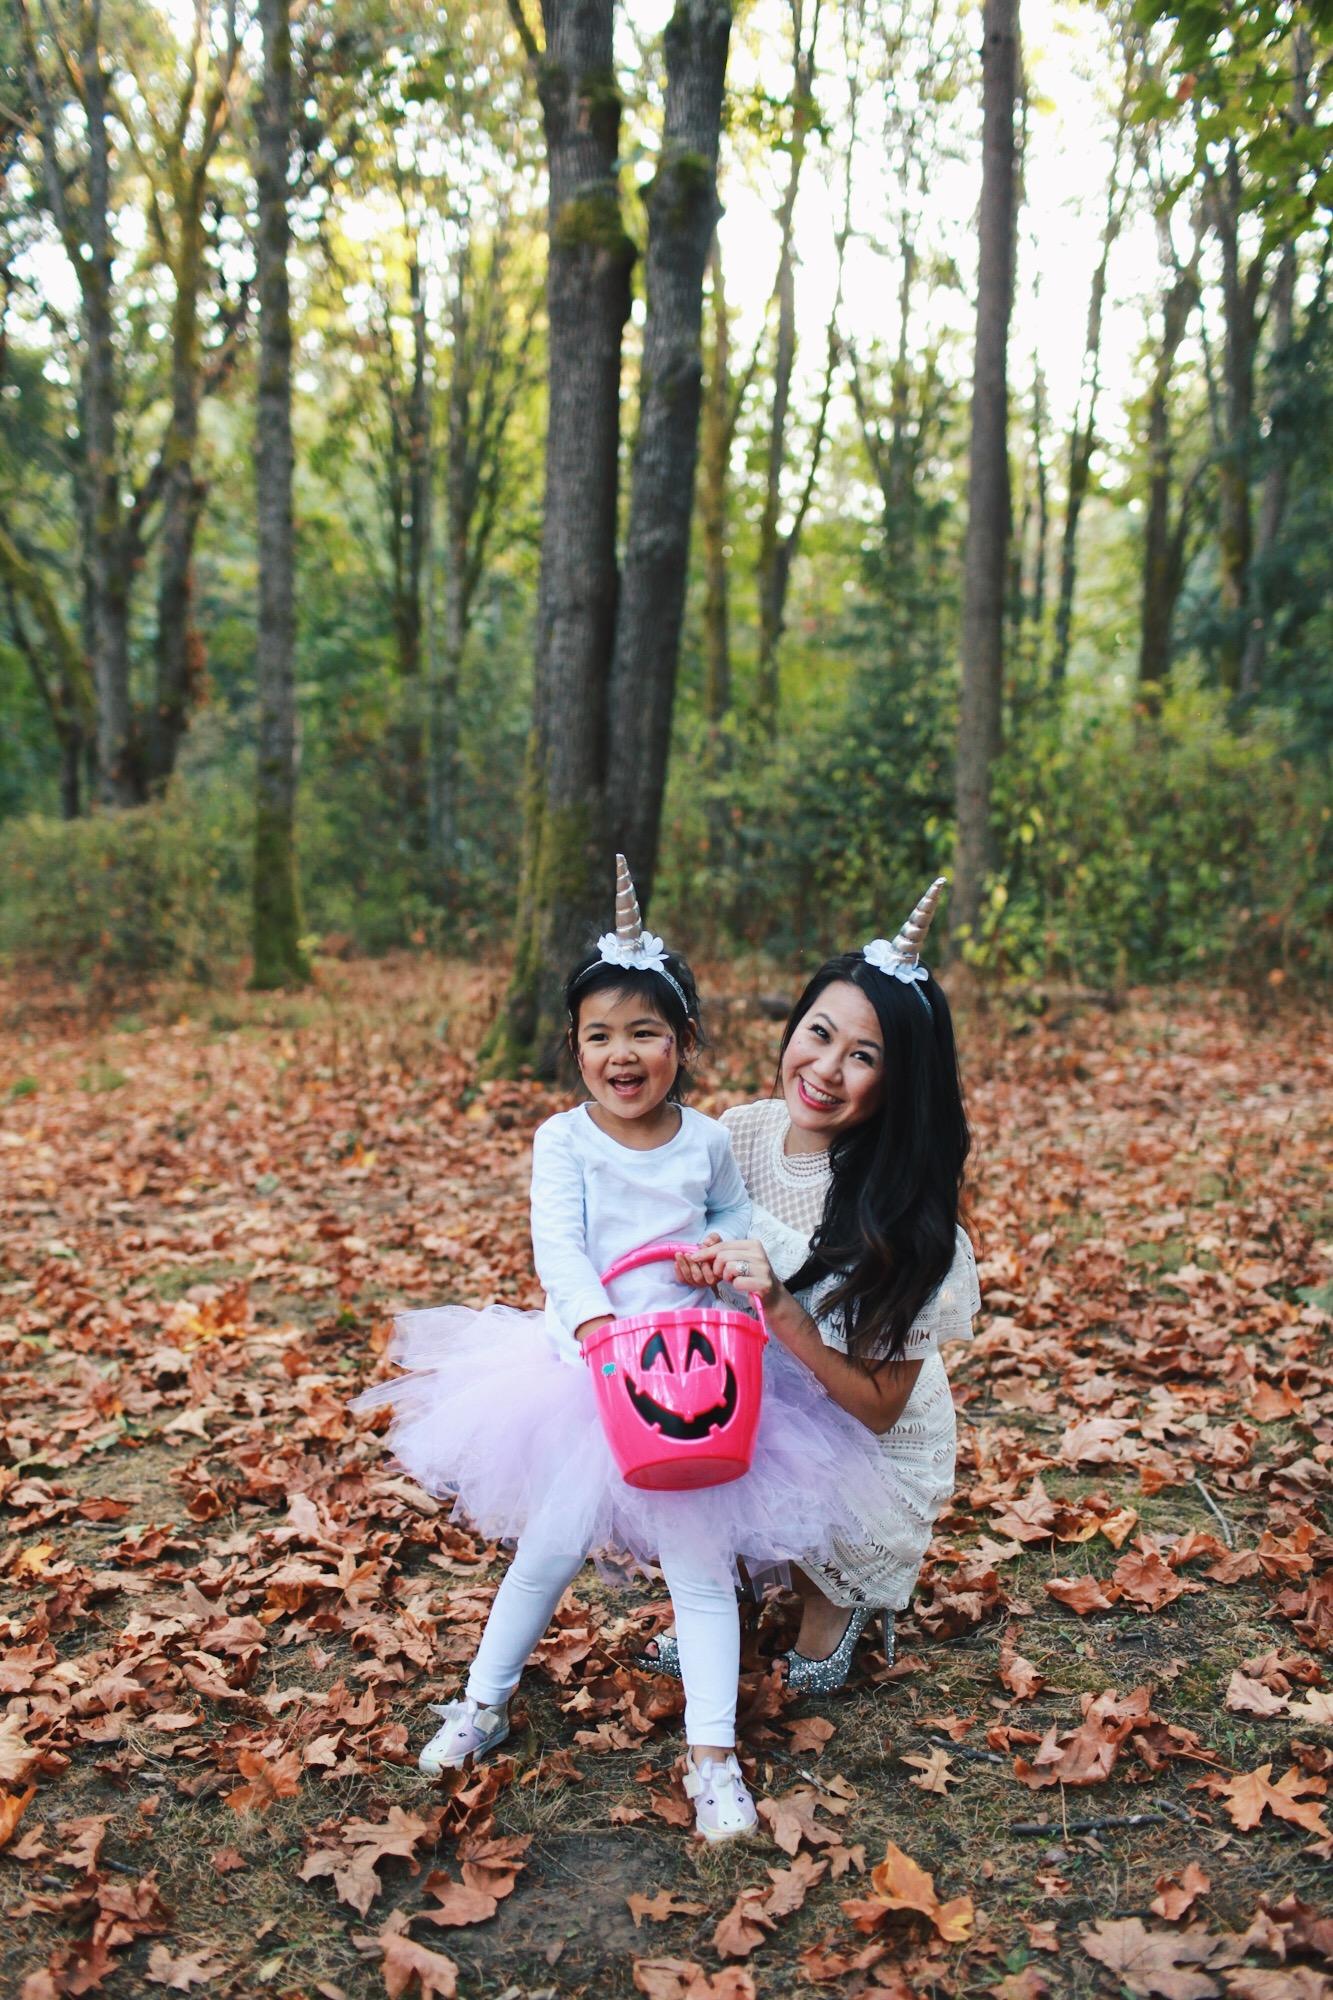 Diy Unicorn Costume Tutu Halloween Costumes For Mom And